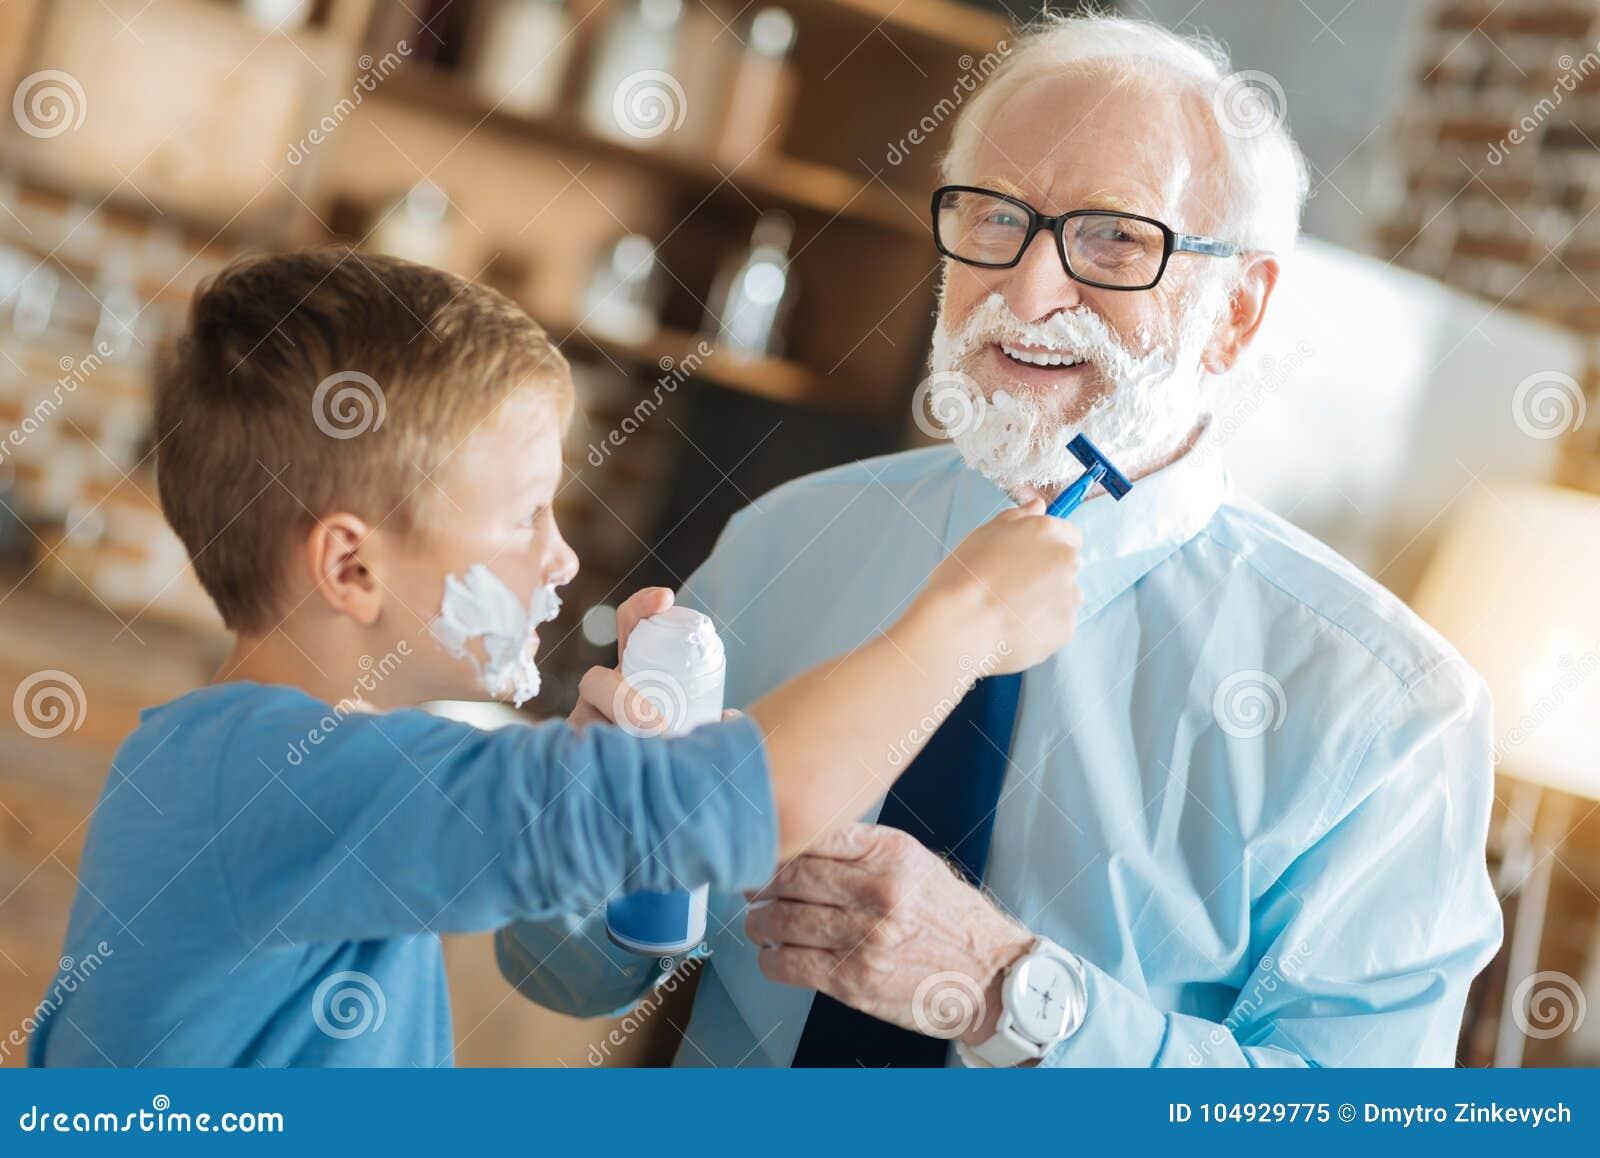 Nice pleasant boy shaving his grandfather